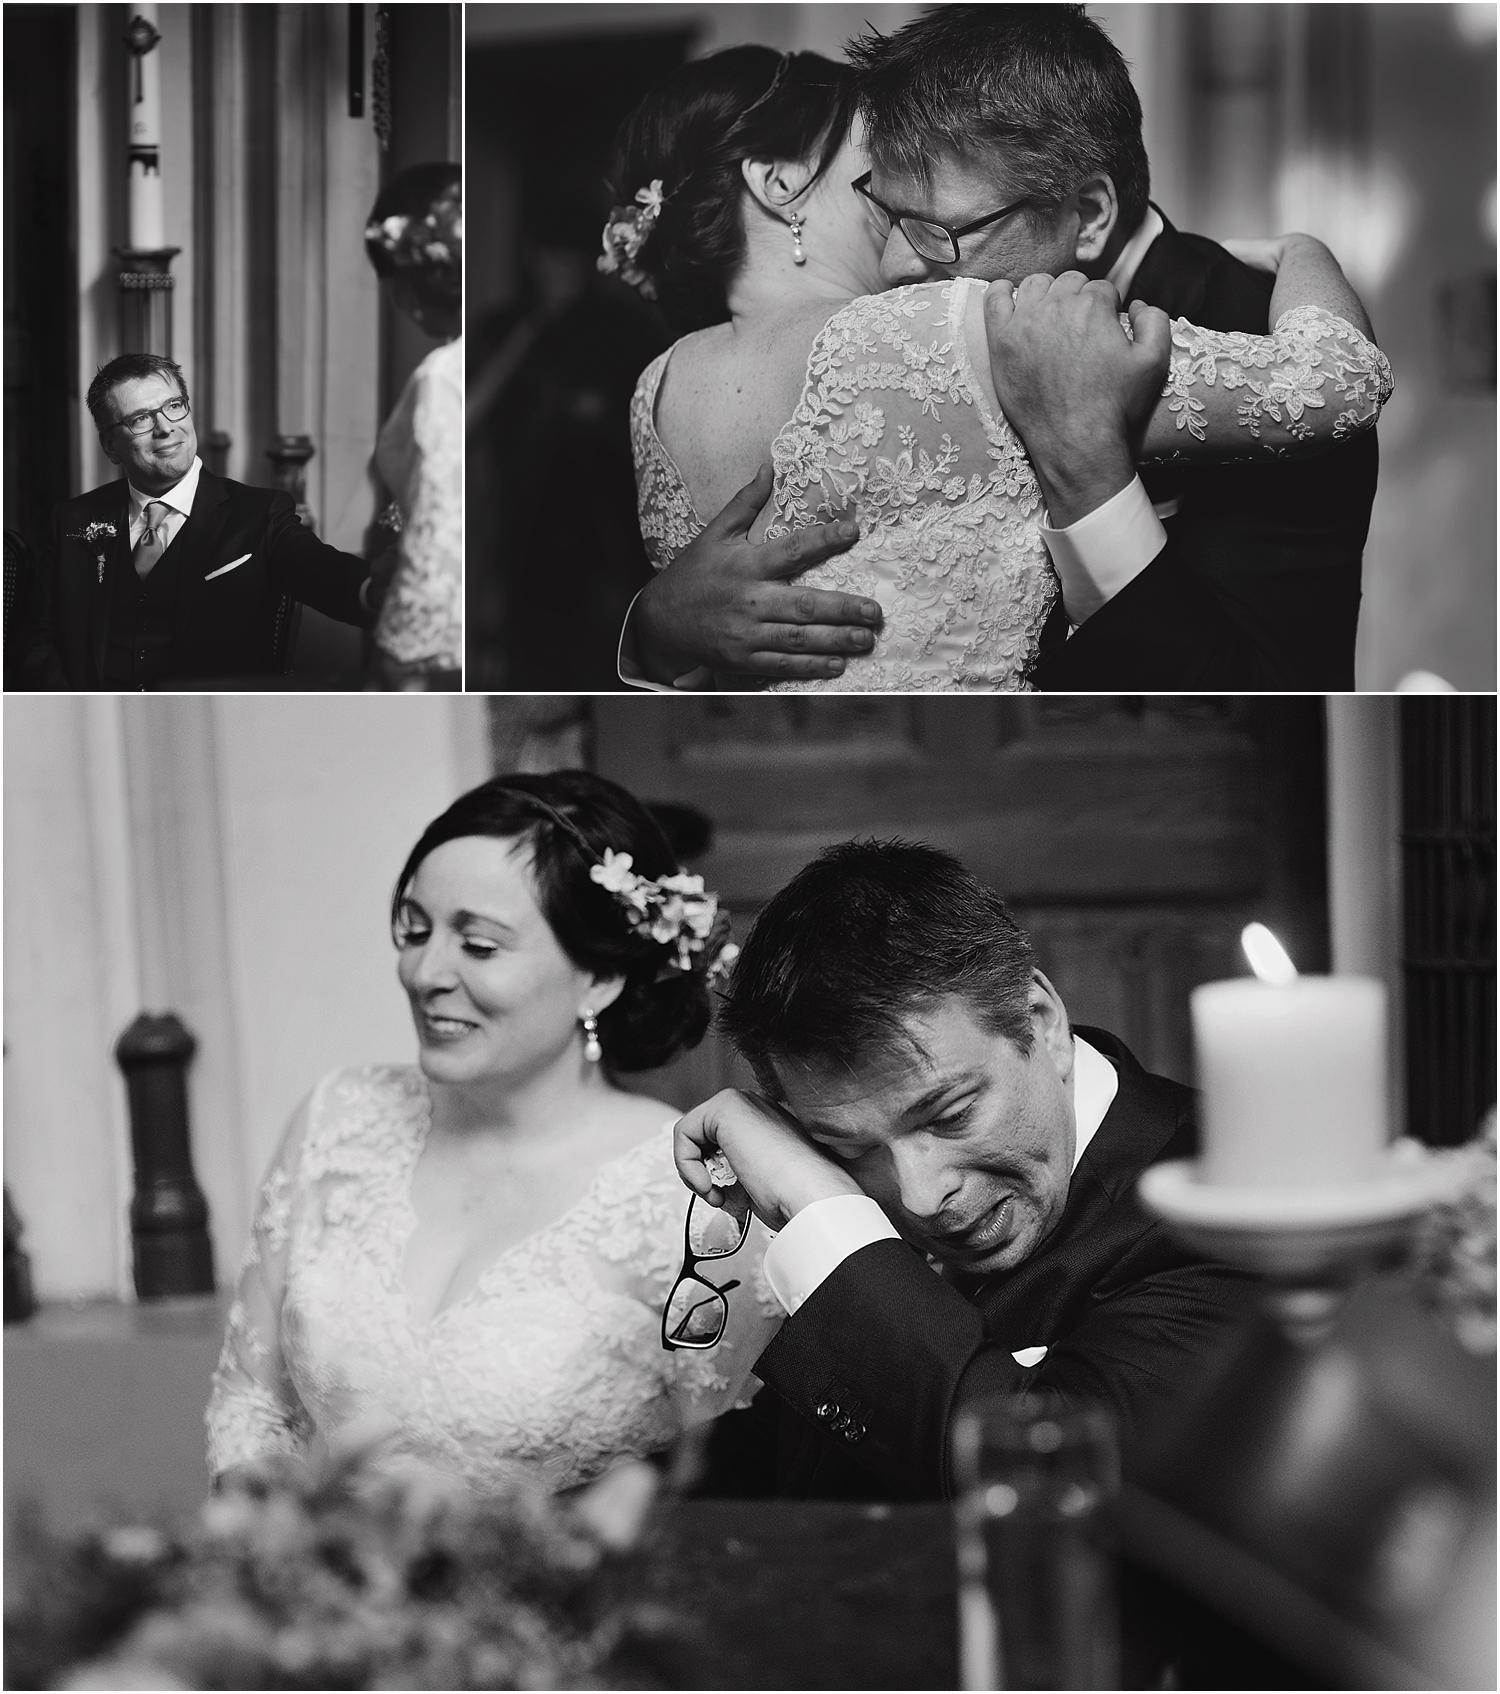 trouwfotograaf maastricht, trouwfotograaf limburg, bruidsfotograaf maastricht, bruidsfotograaf limburg, fotograaf maastricht, trouwen cellebroederskapel, thuisbruiloft, trouwen in je eigen tuin, trouwen in maastricht, trouwen in zuid-limburg, trouwen in eys